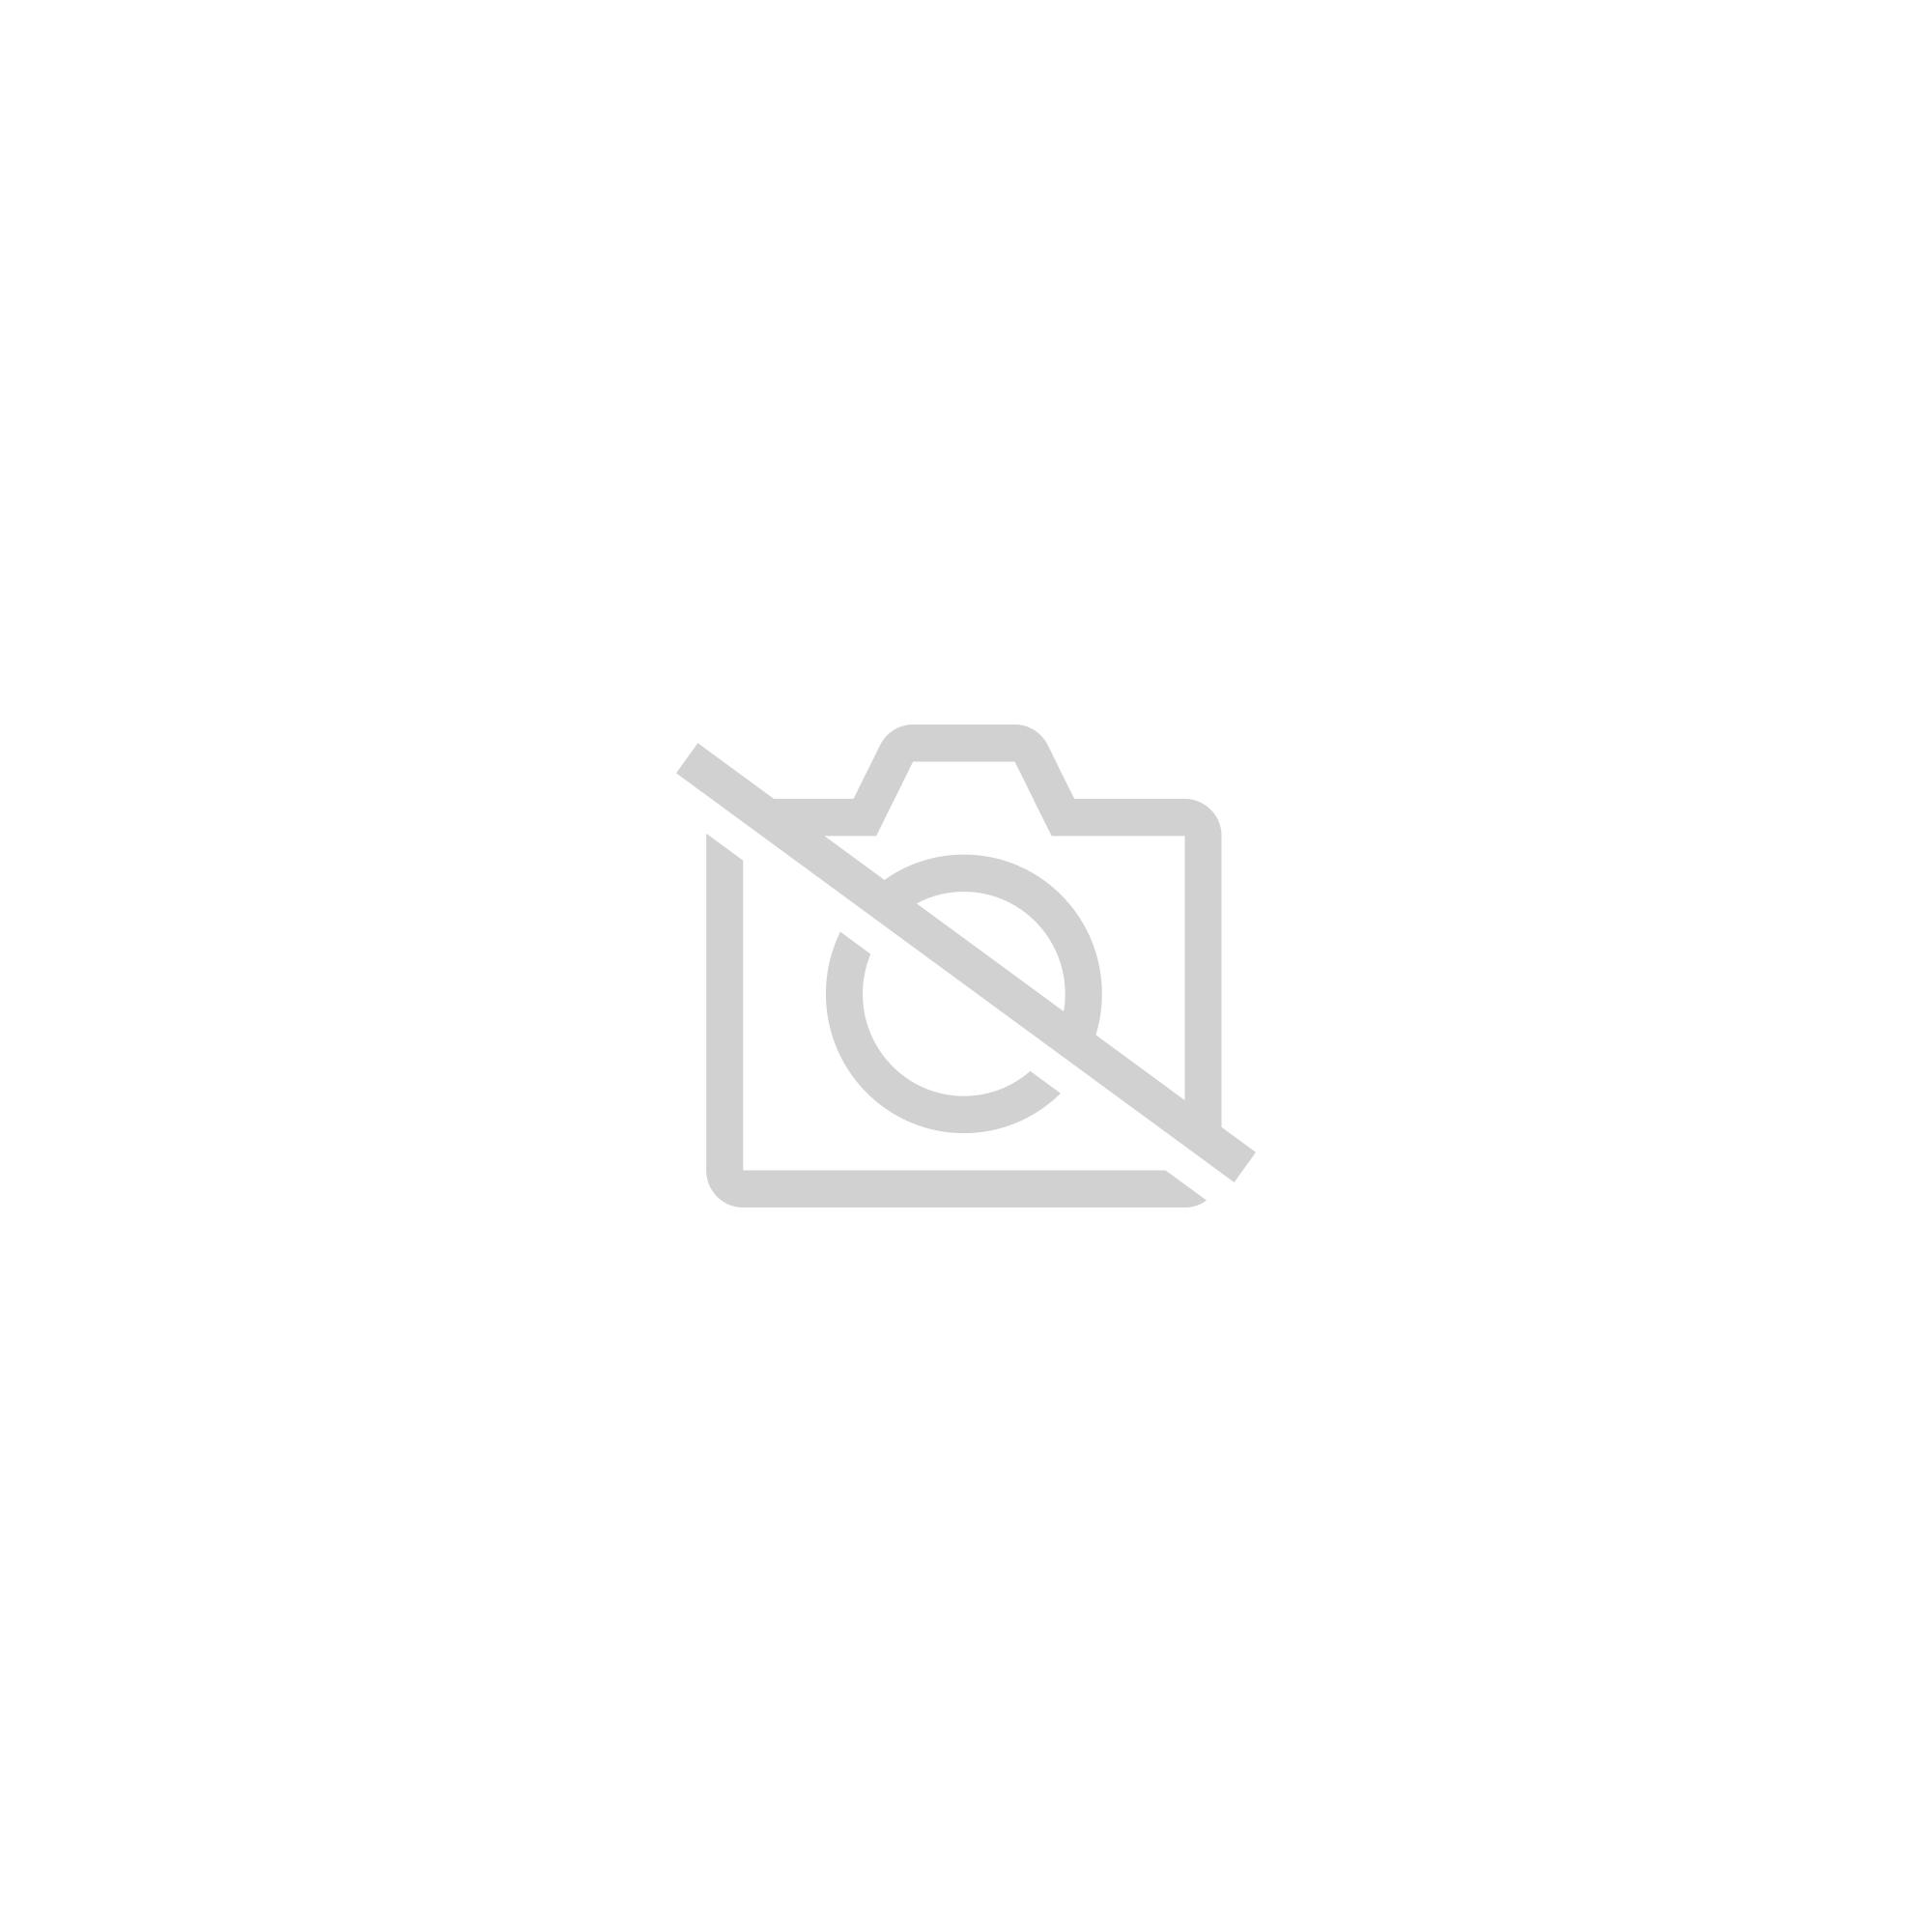 BARILLET SERRURE PORTE AVANT GAUCHE L NEUF BMW 3 E46 1998